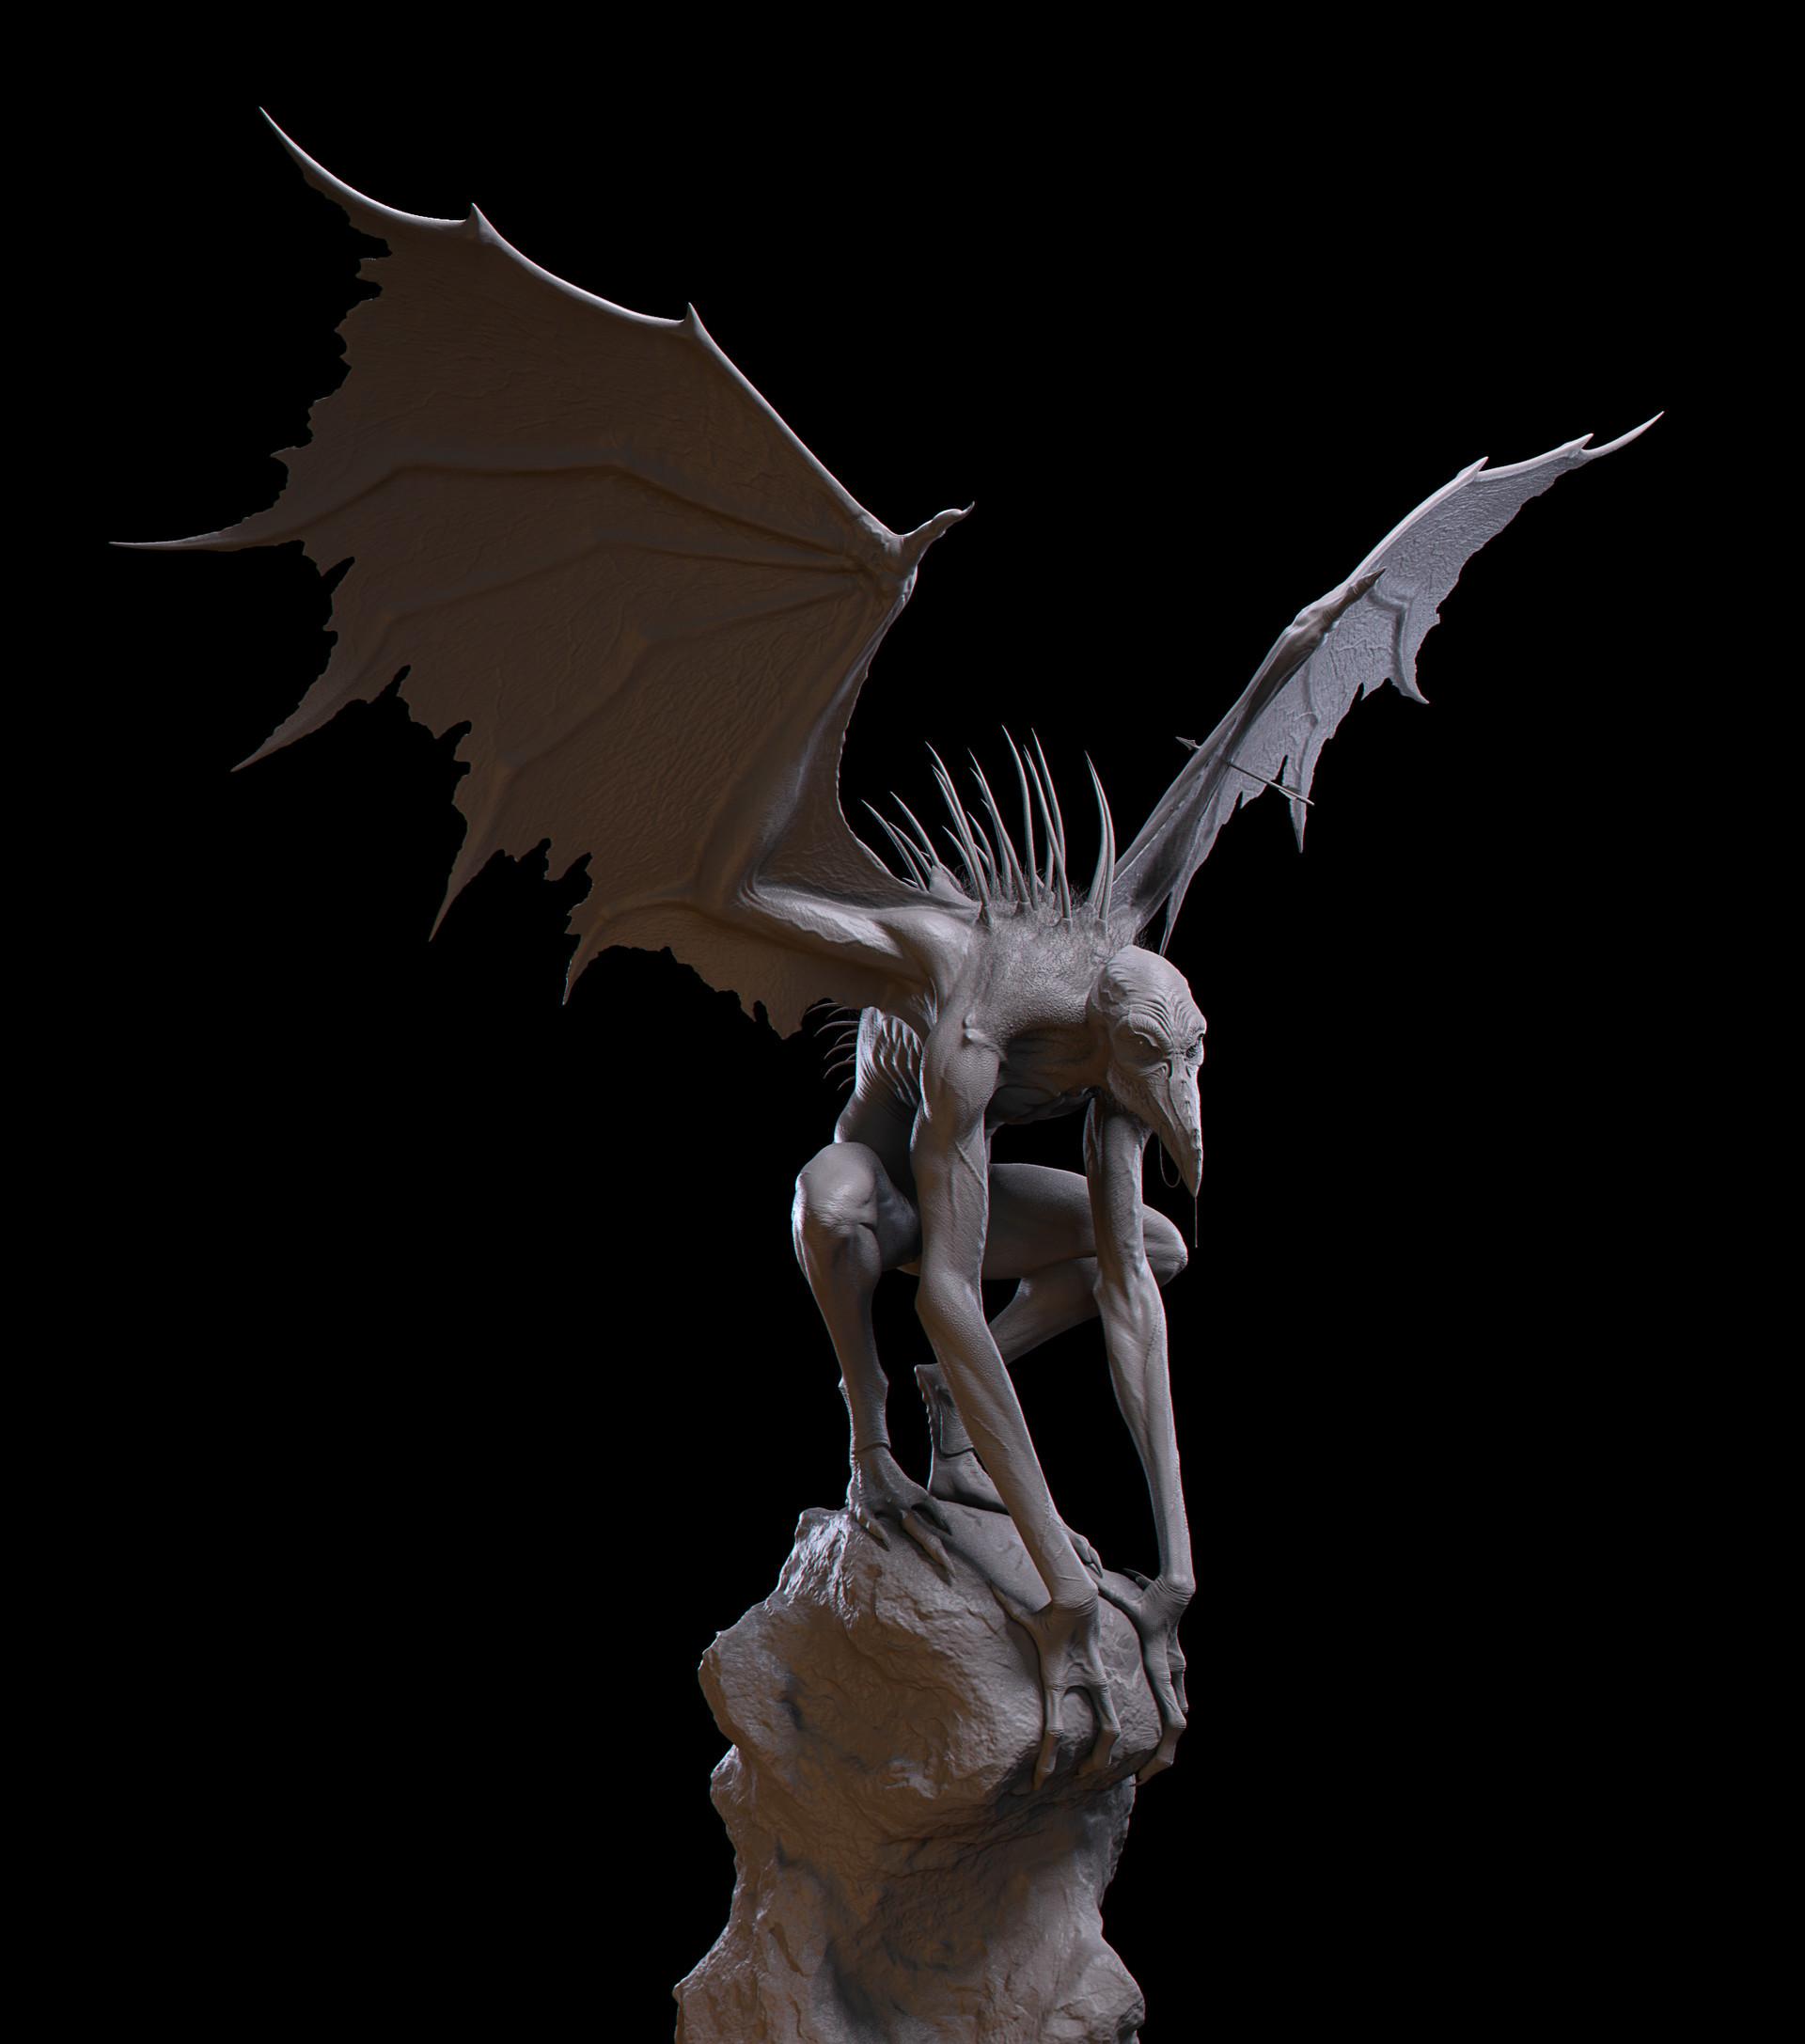 Alec hunstx creaturemod alechunstx harpyfinal clay